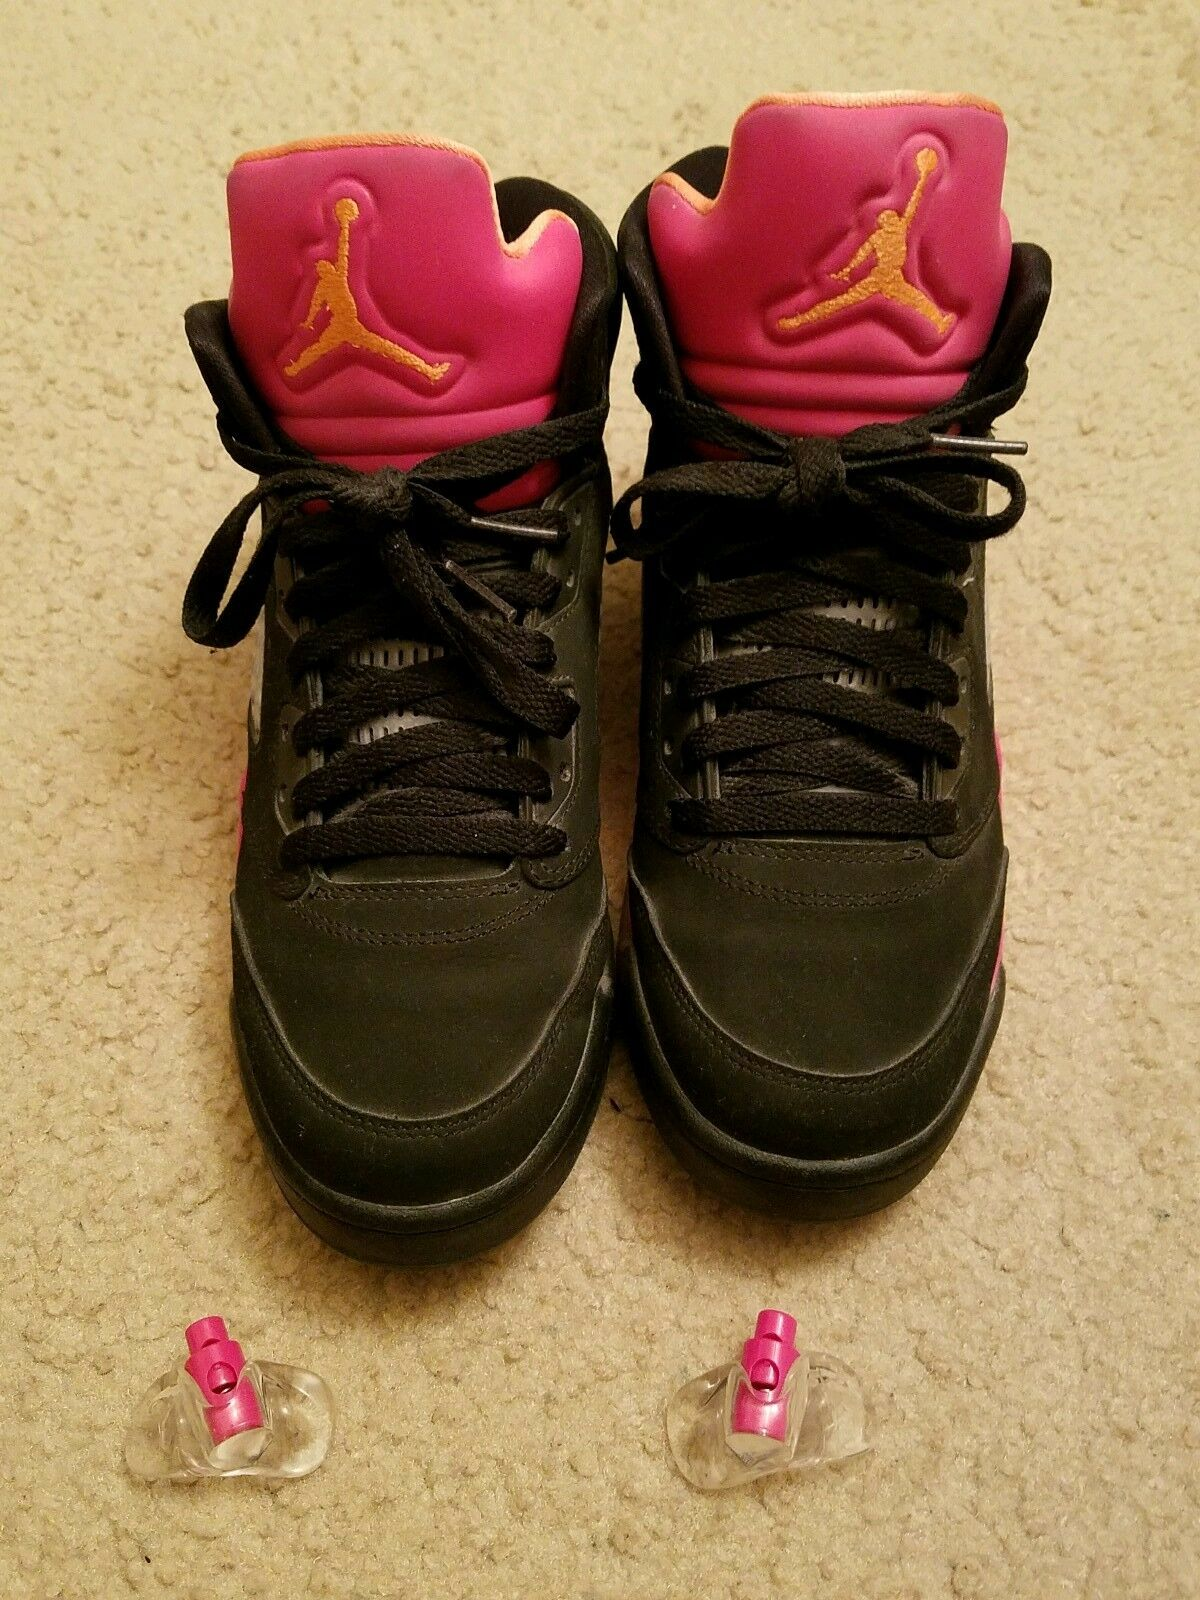 Jordan Retro 5 - orange Pink Black - Size 6.5Y